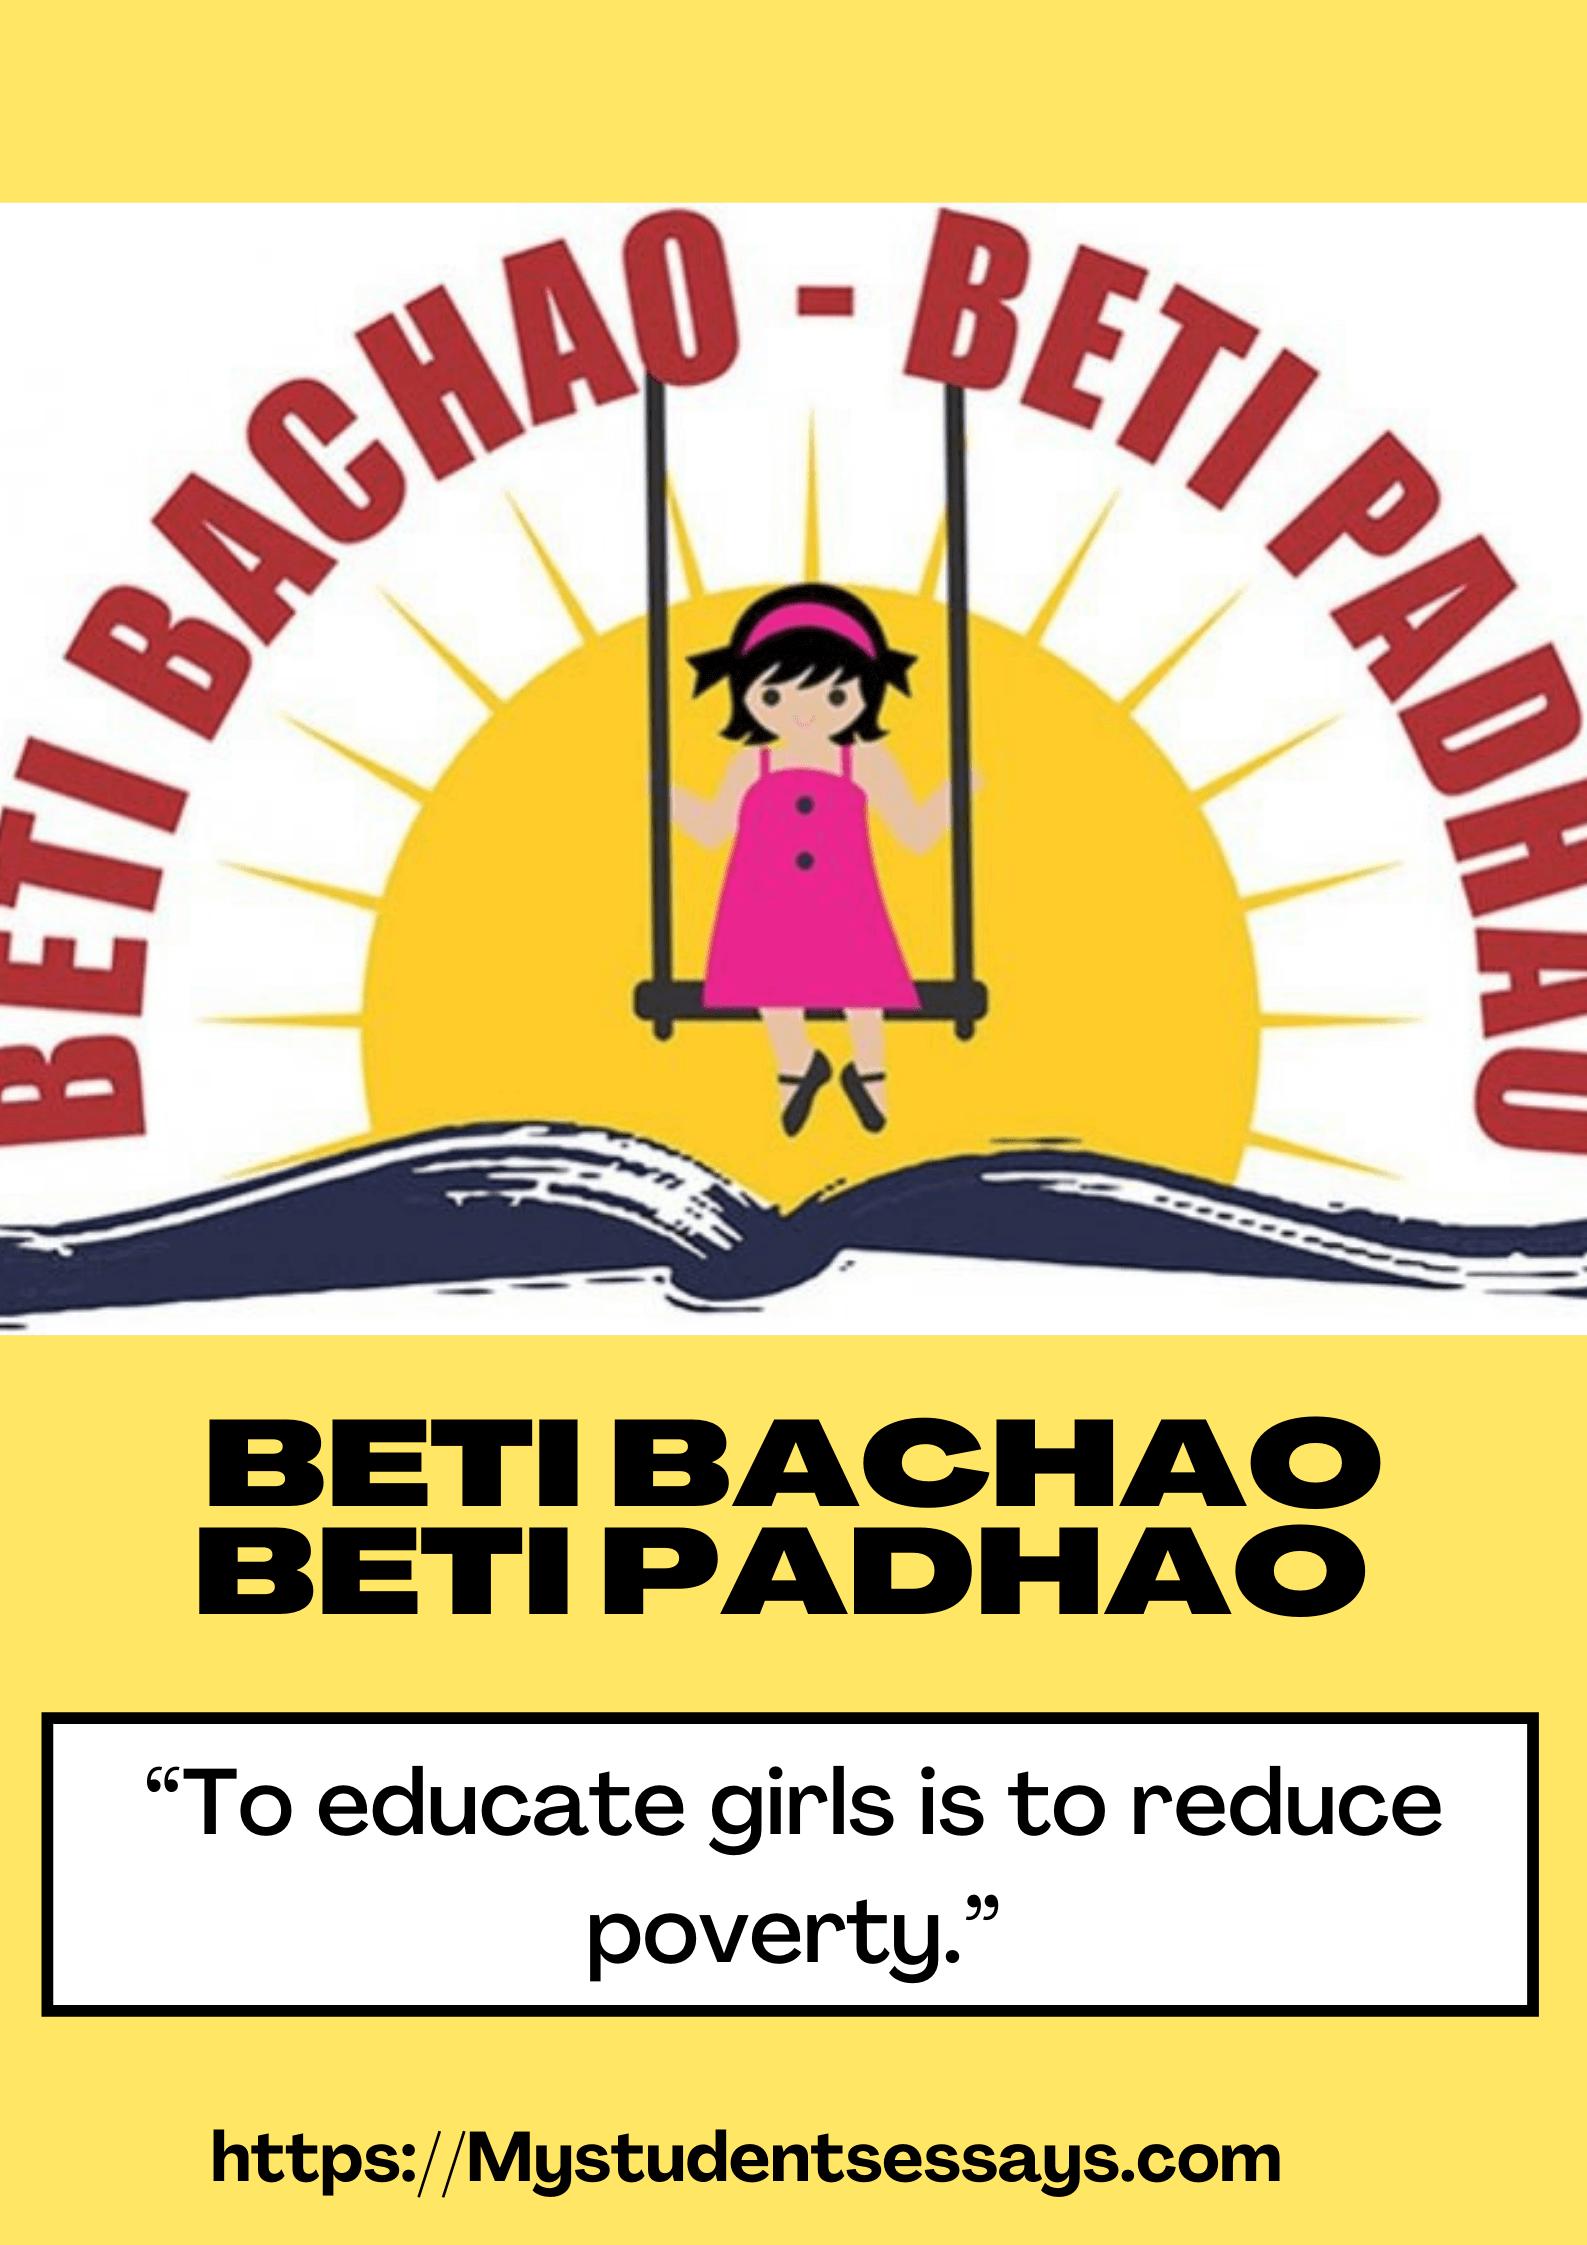 Beti bachao beti padhao essay for students